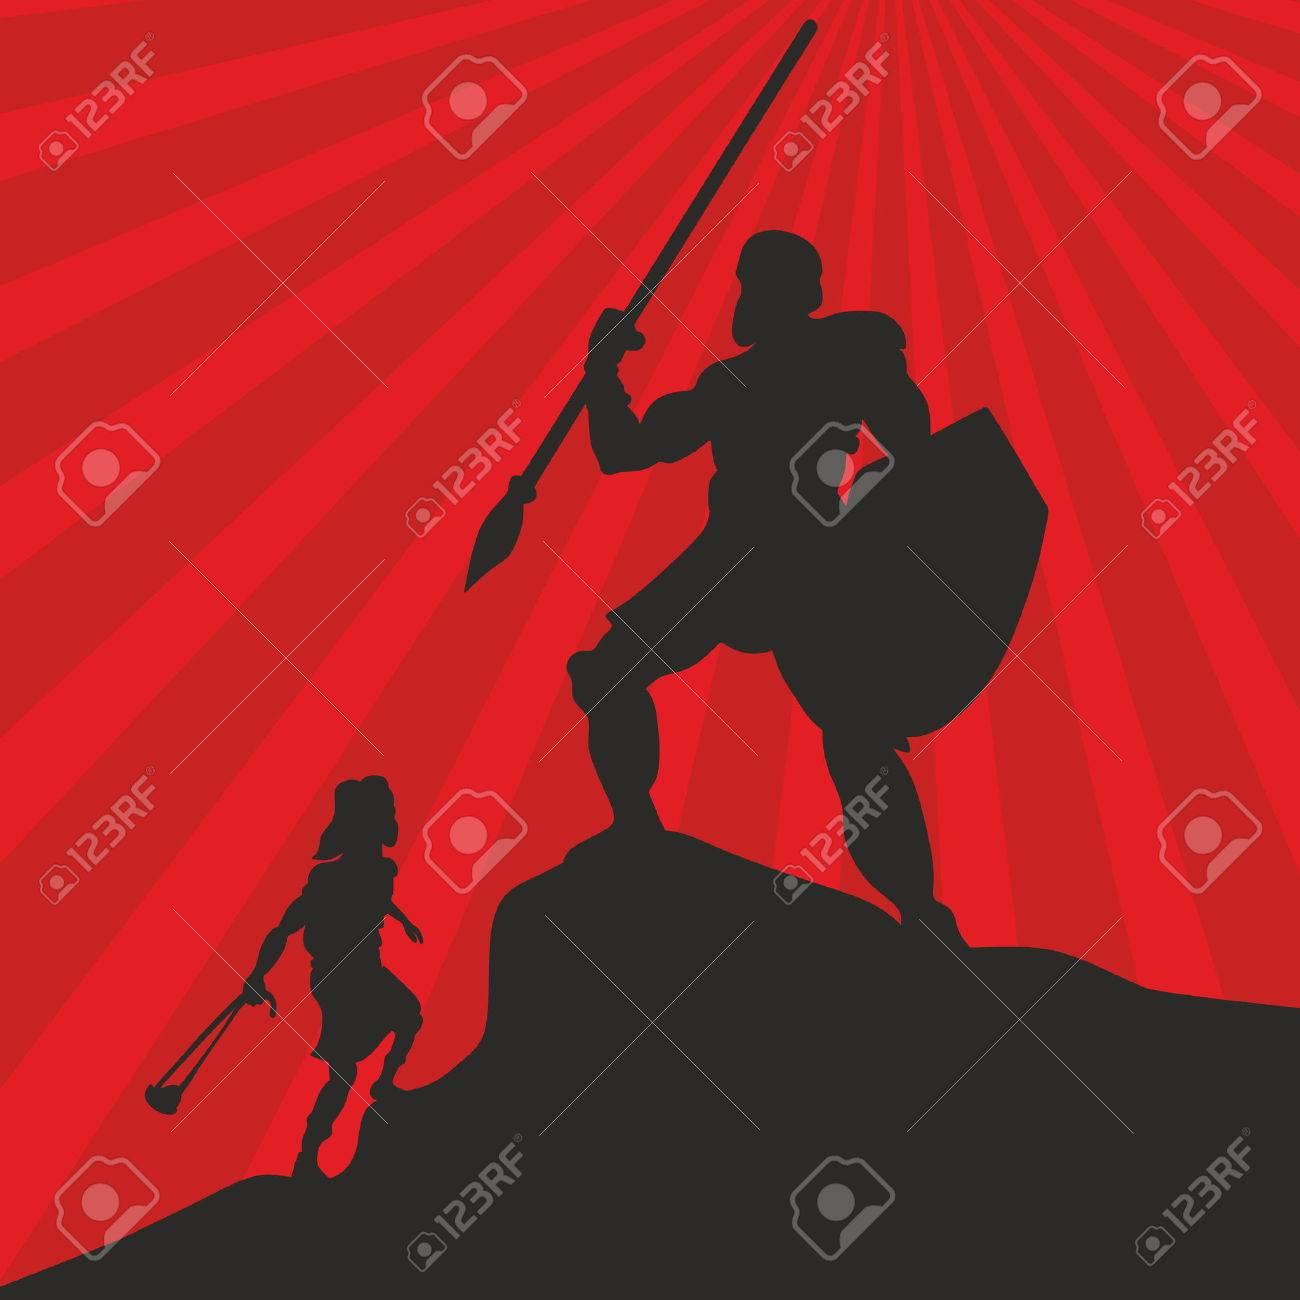 David and Goliath. Silhouette, hand drawn - 46944520